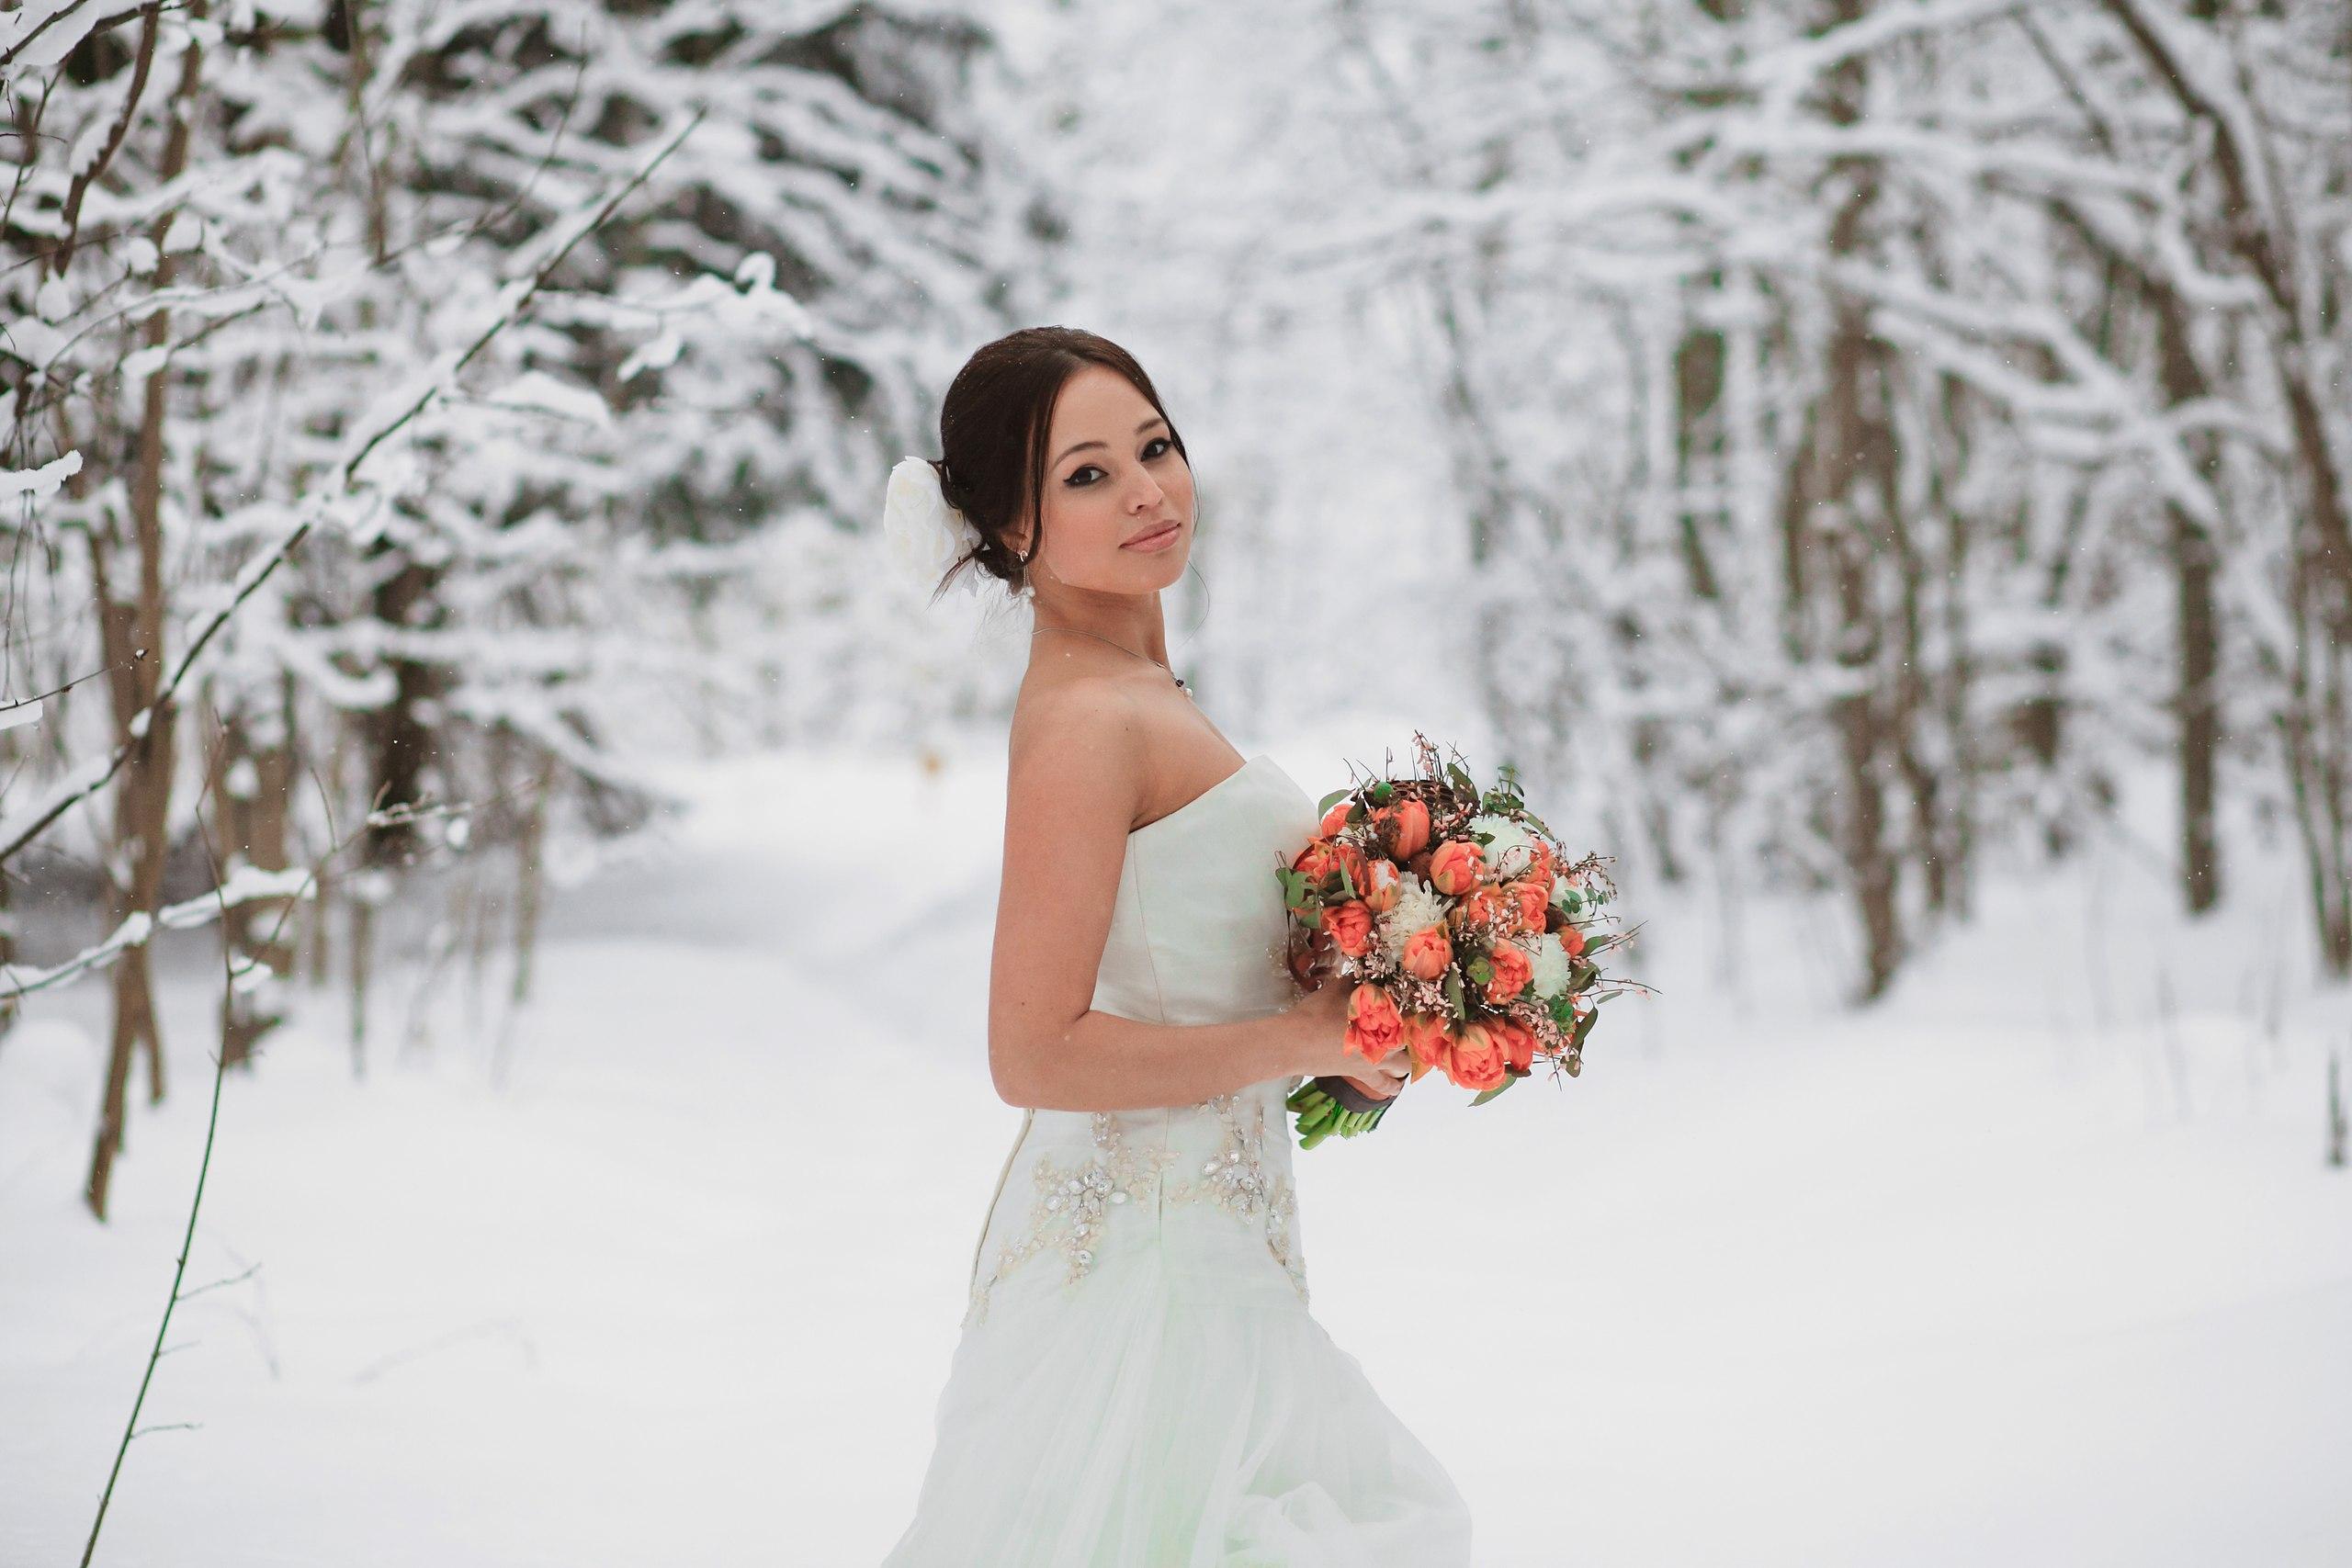 KOBL079cn7A - Готовимся к свадьбе: праздник своими руками